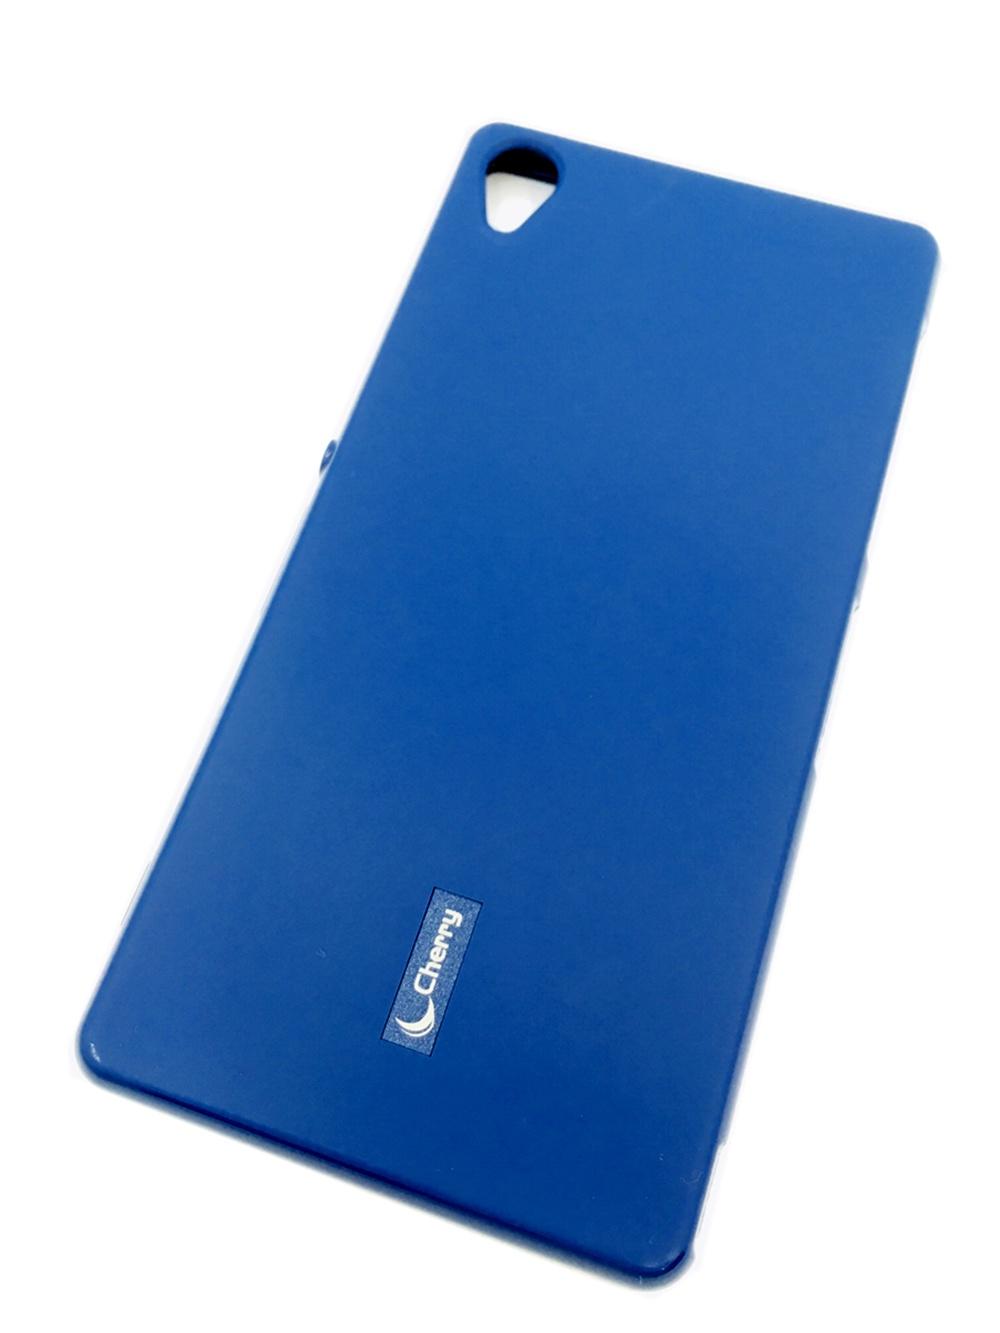 Чехол для сотового телефона Cherry Sony Z3 Накладка резиновая с пленкой на экран, синий